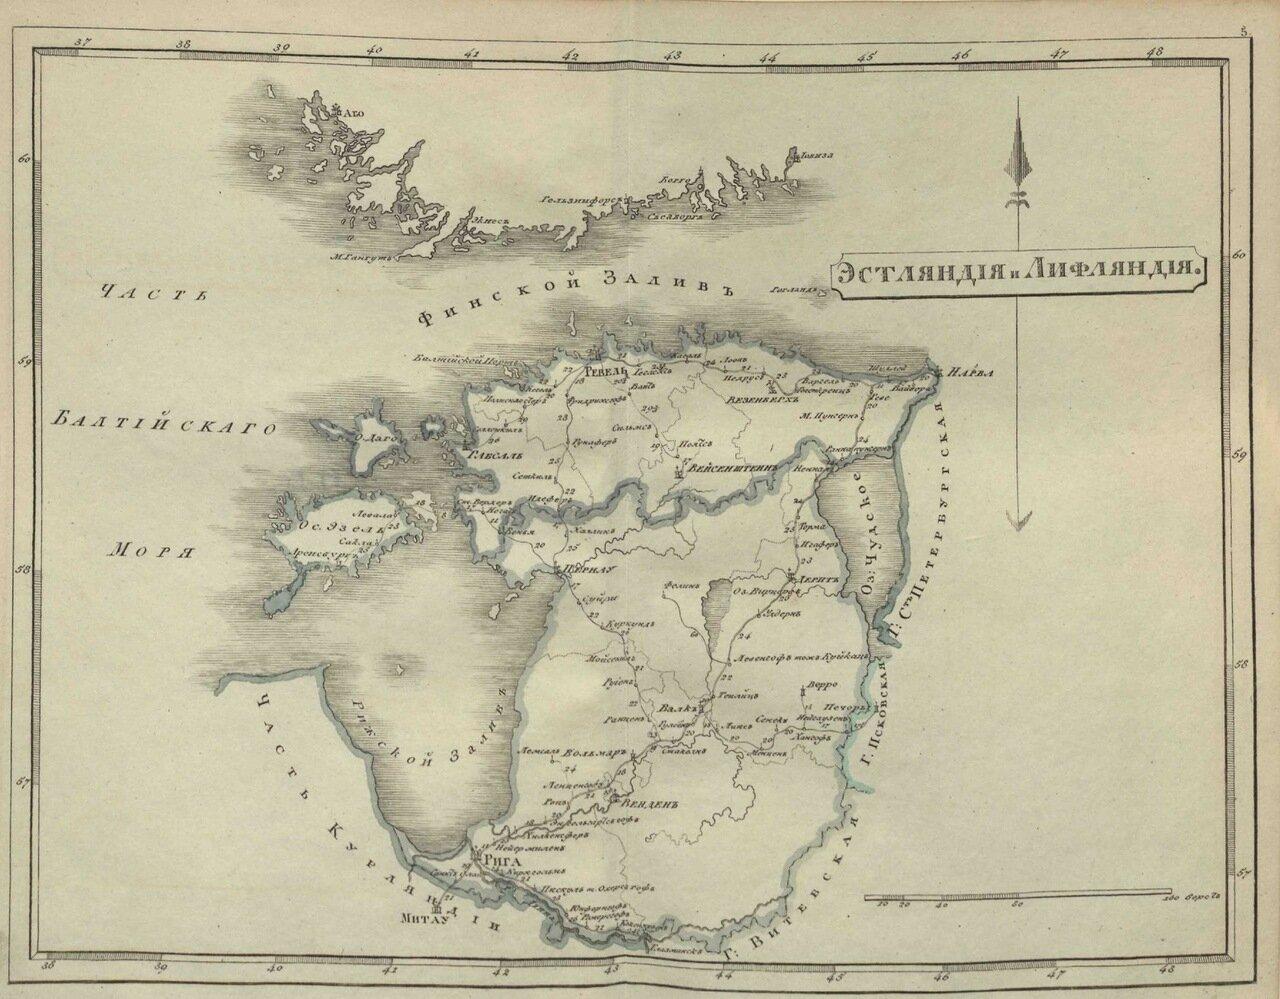 5.Эстляндия и Лифляндия